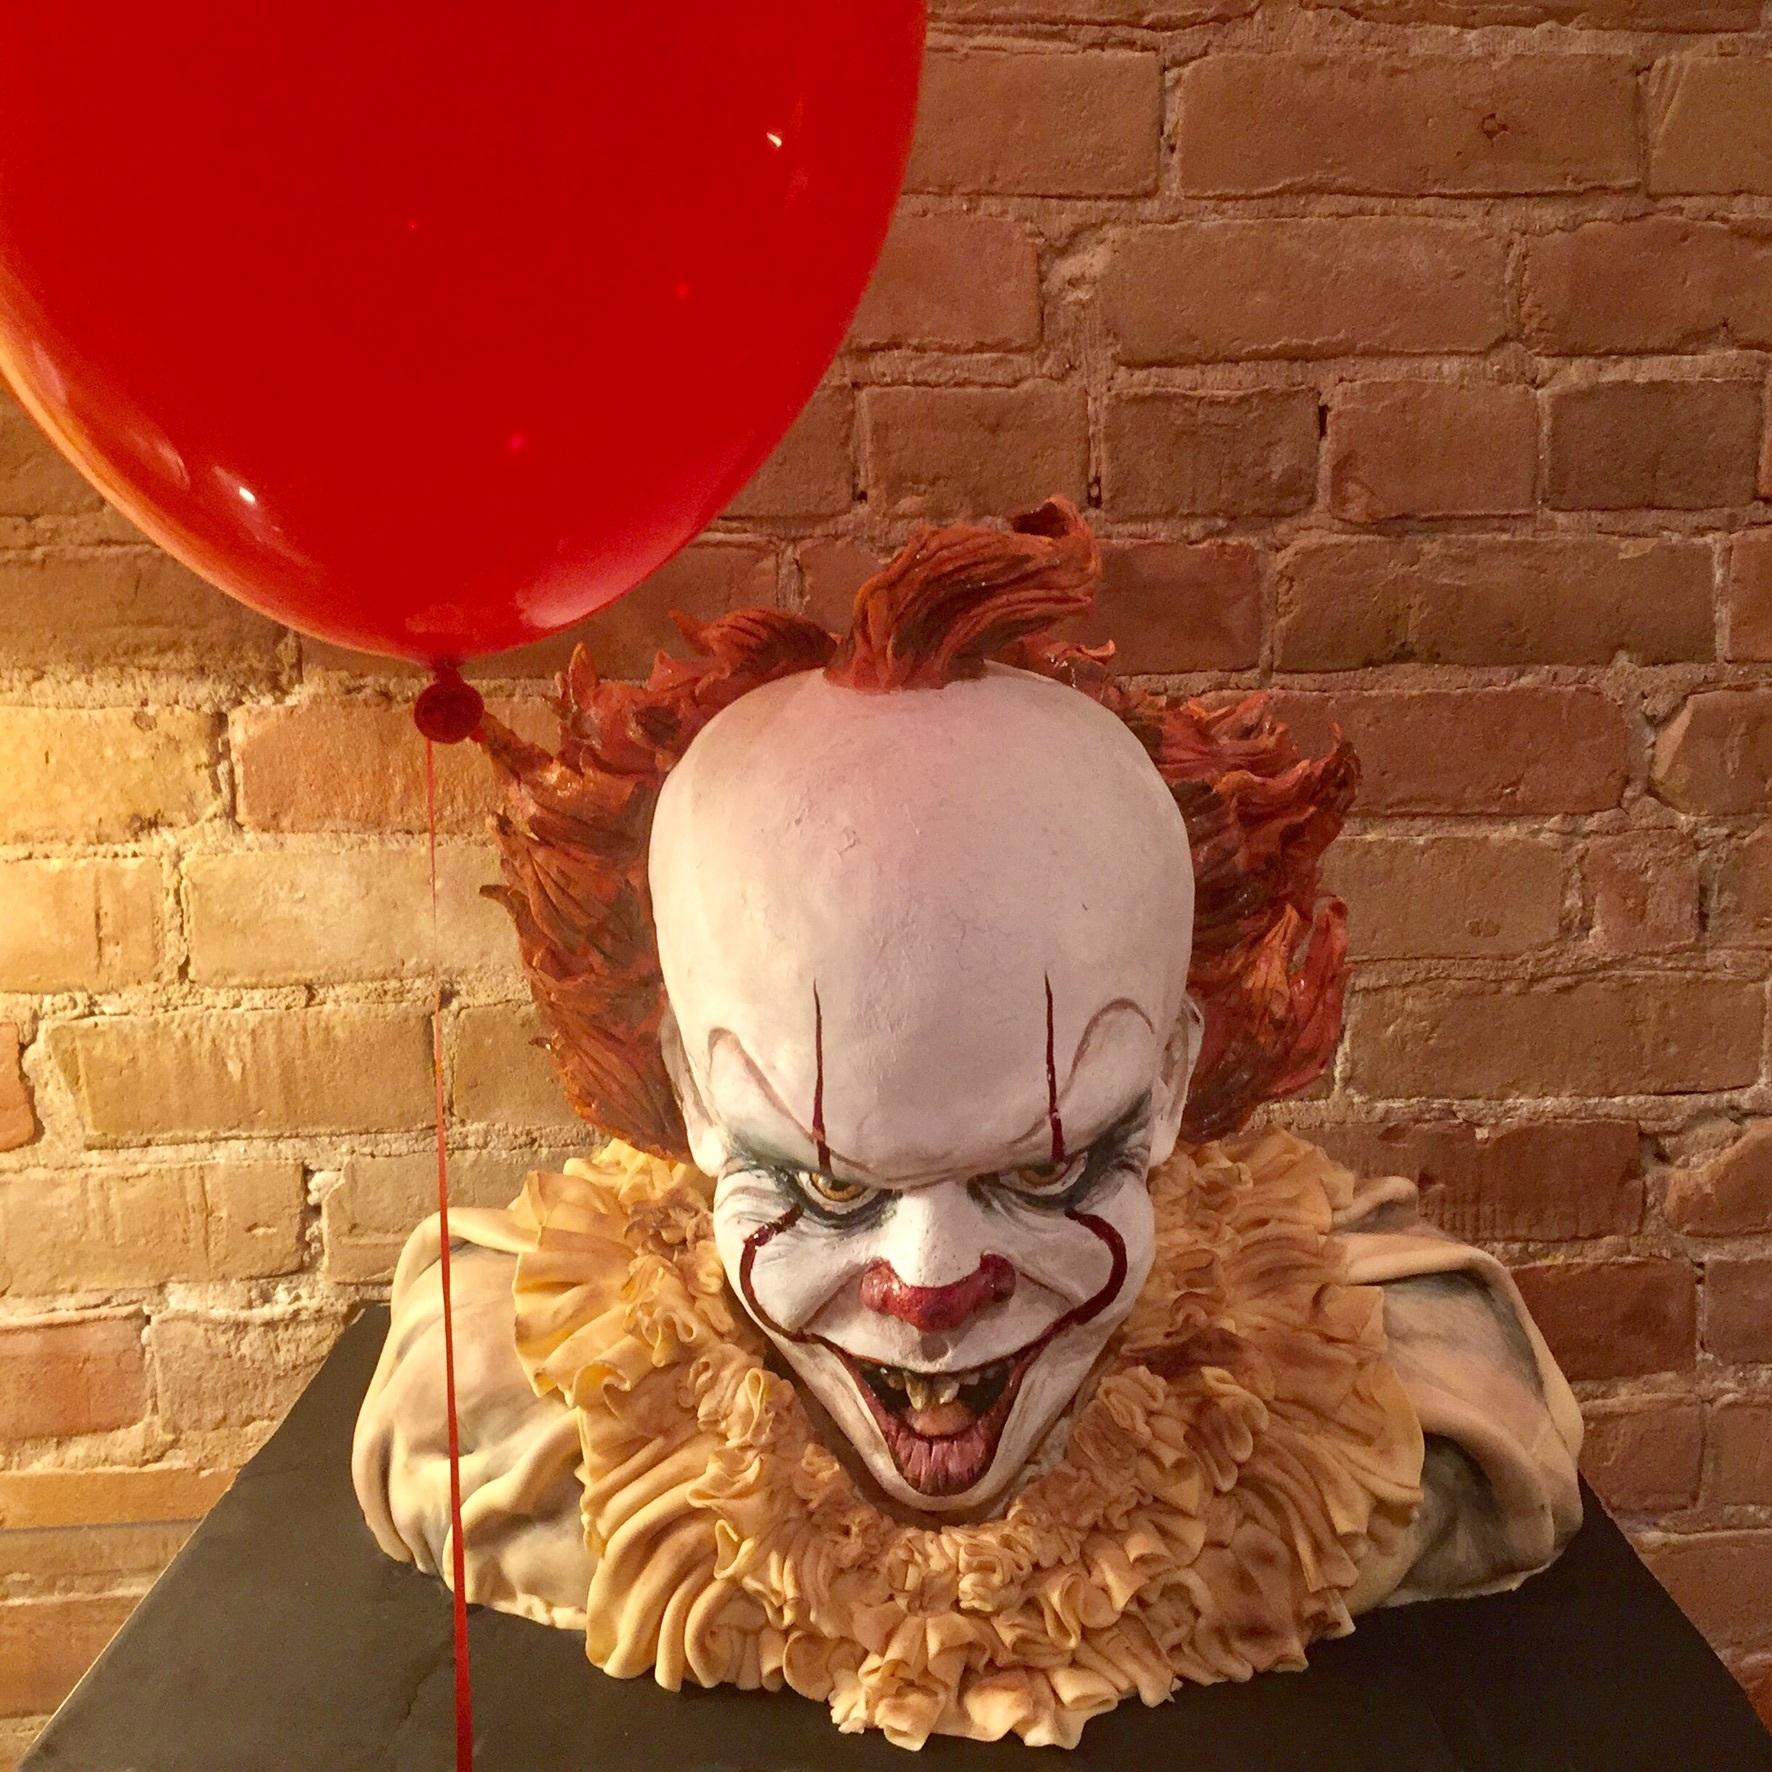 Creepy Clown bust cake